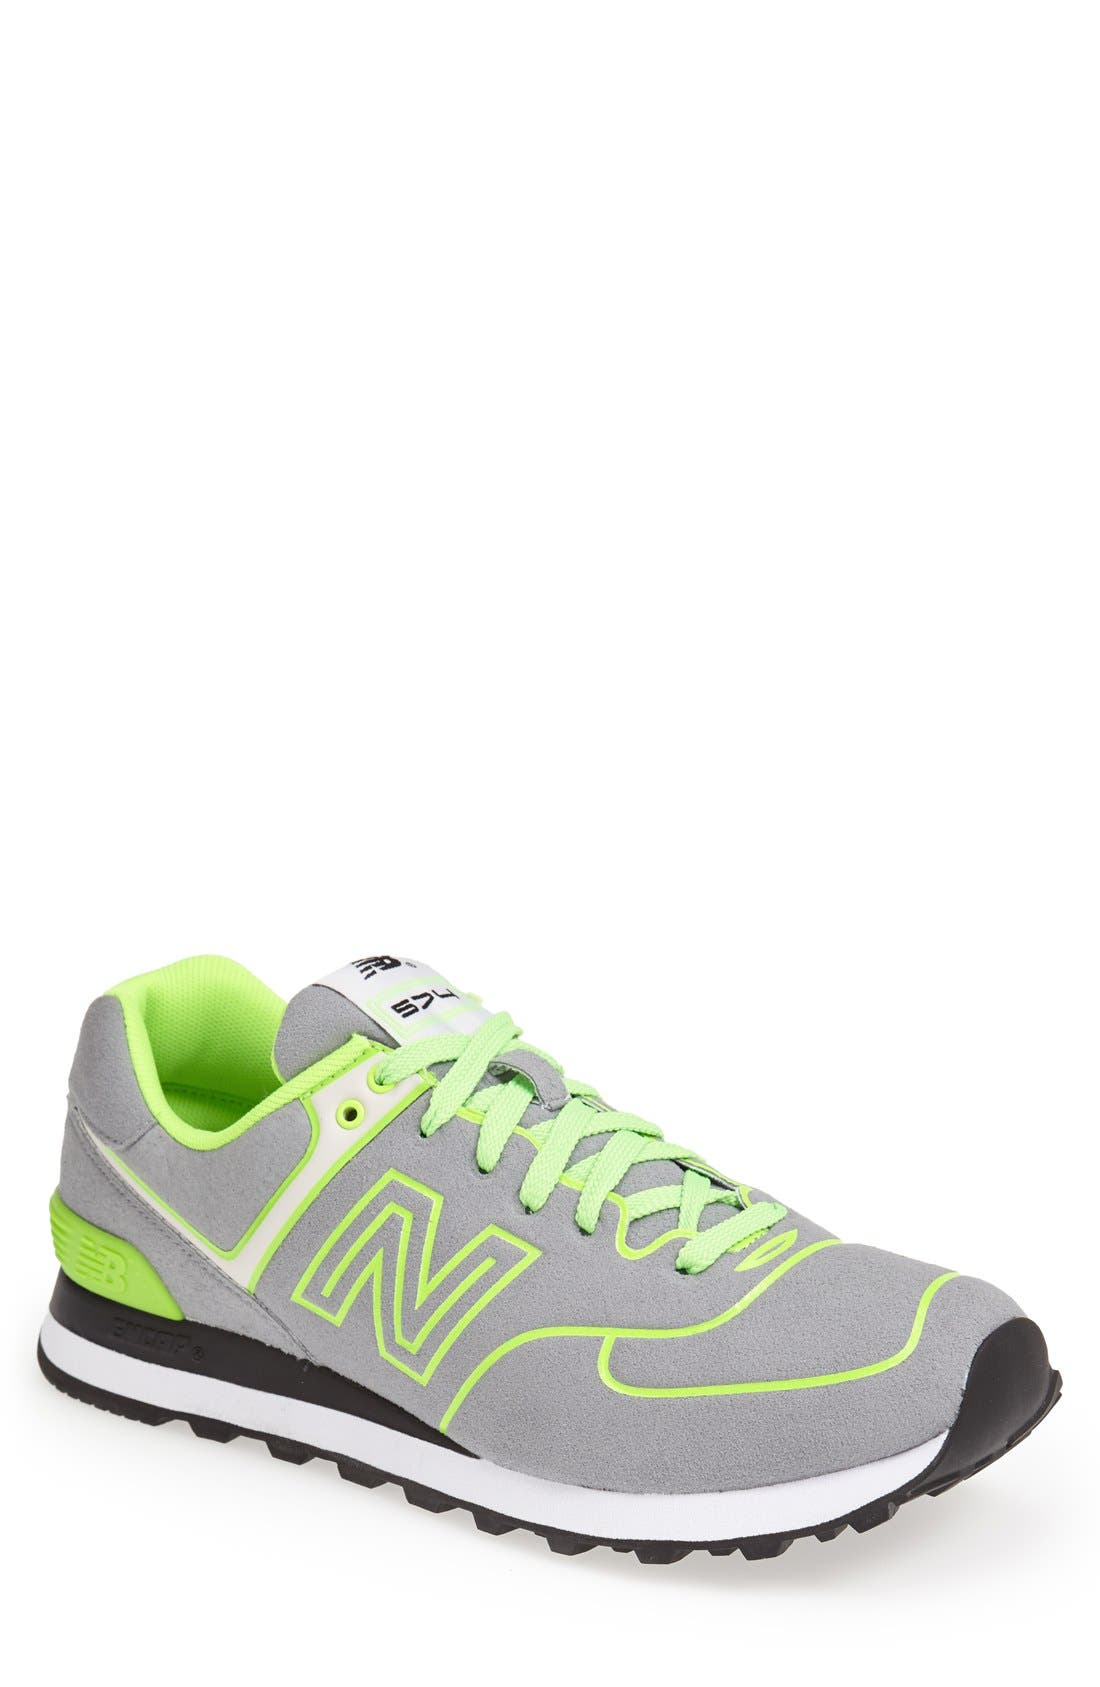 Main Image - New Balance '574 Neon' Sneaker (Men)